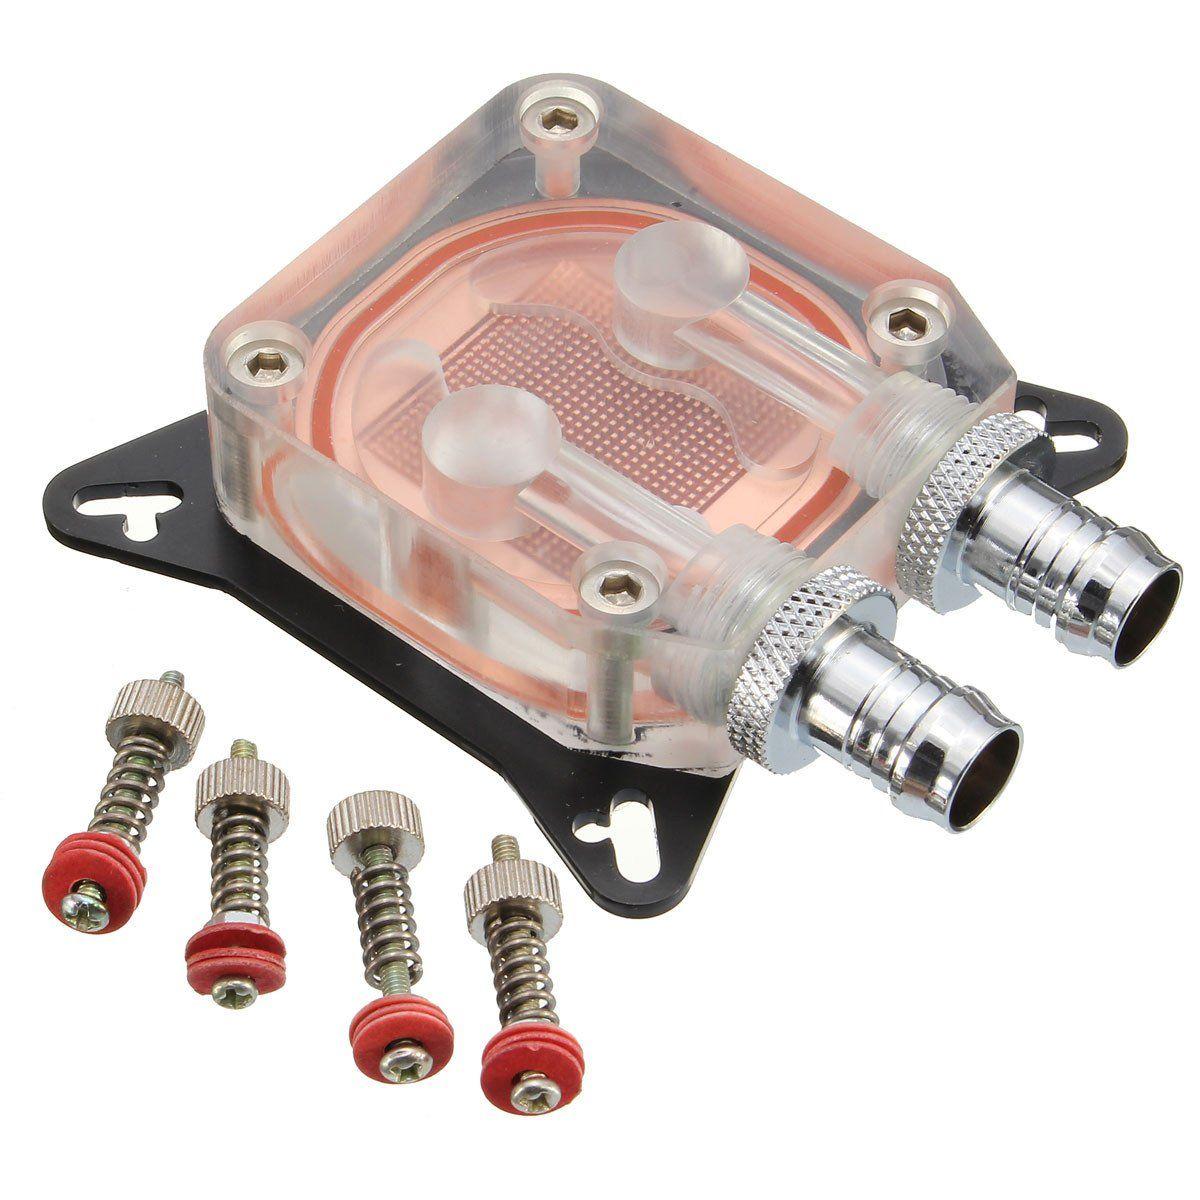 Gpu Water Cooling Block Pc Copper High Performance Liquid Cooler Amd Equipment Tools 2pcs Gwinstek Lcr Kelvin Test Clip Bridge Nvidia W40